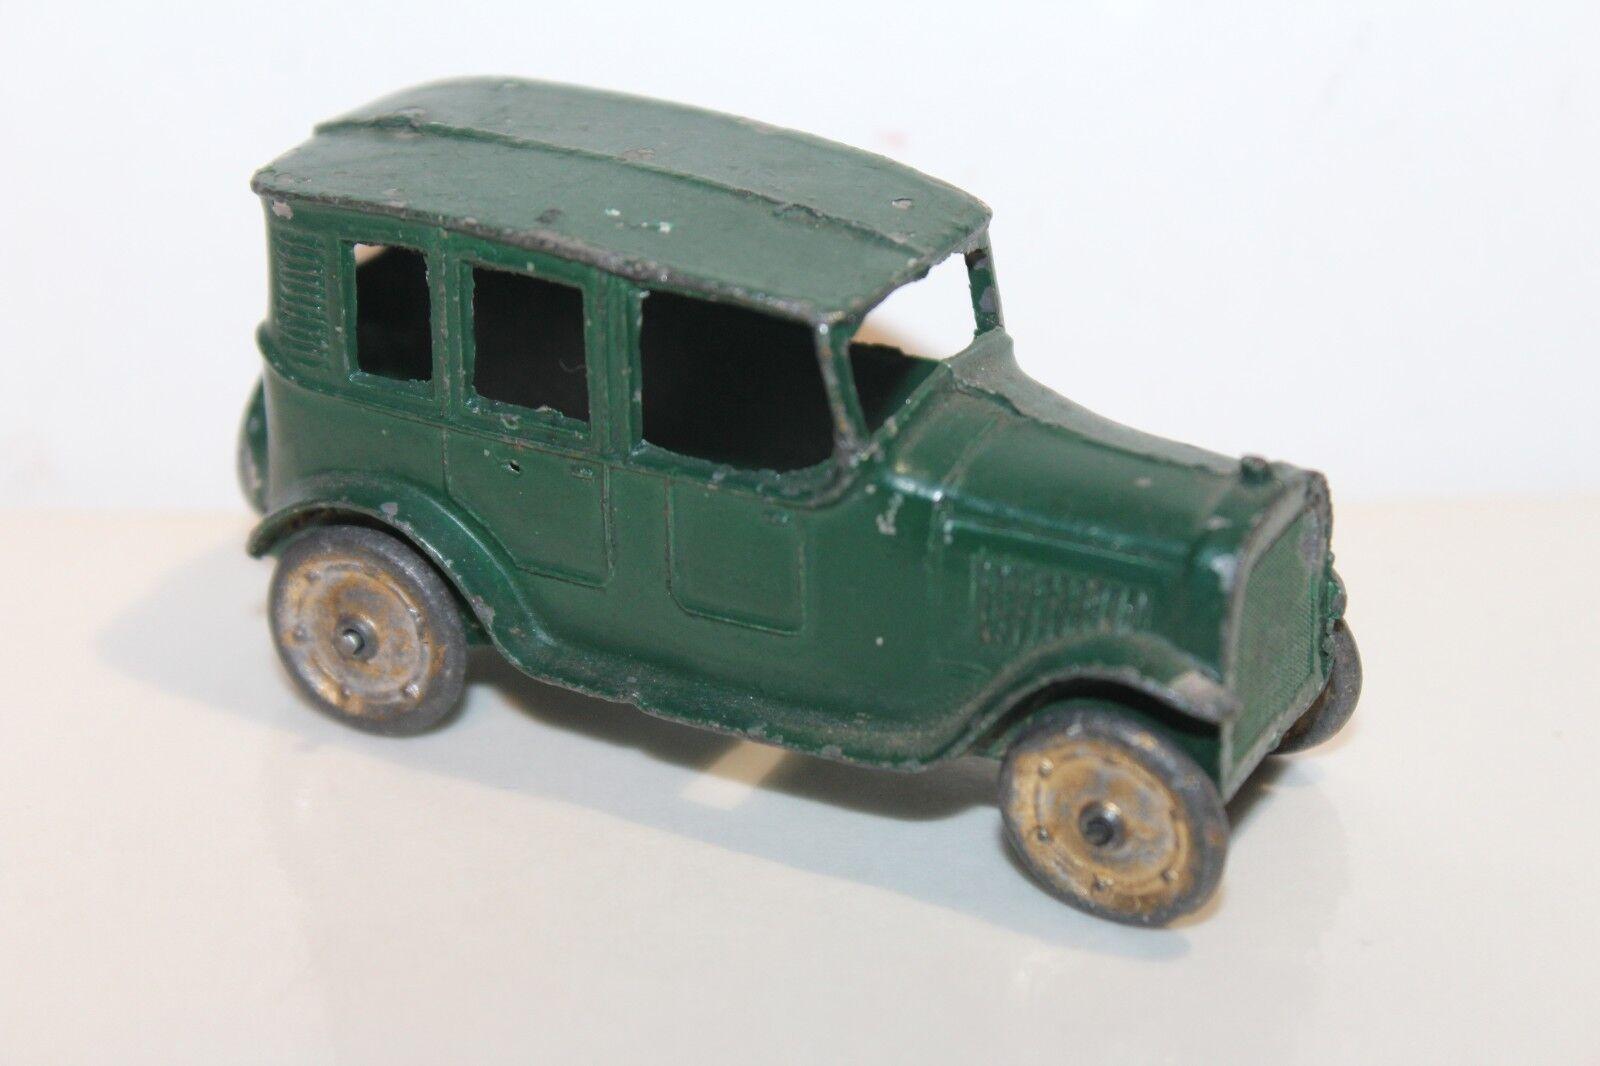 NICE 1920's TOOTSIETOY YELLOW CAB SEDAN circa 1921